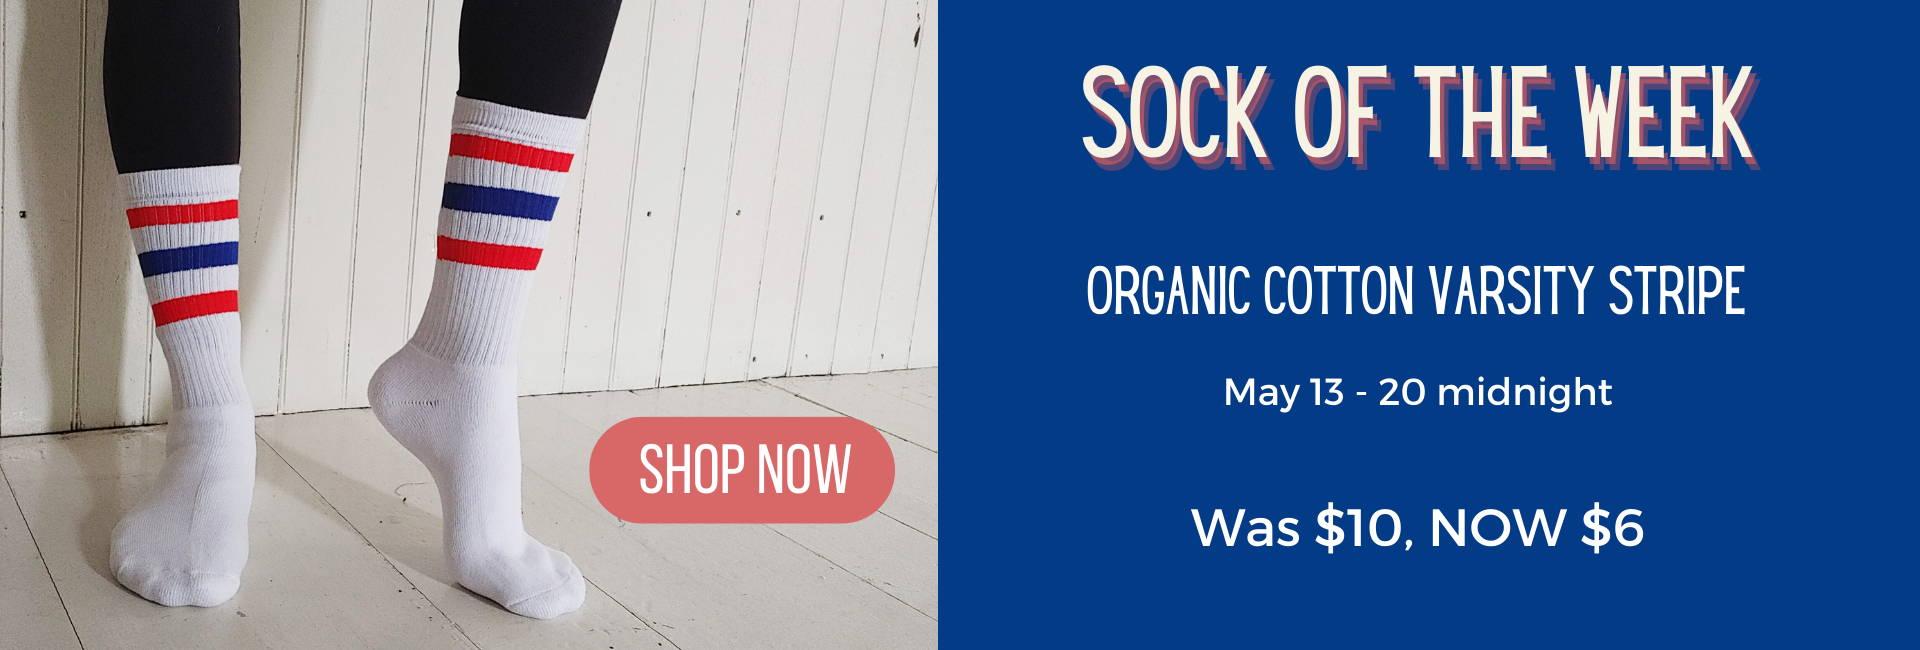 organic cotton varsity sock